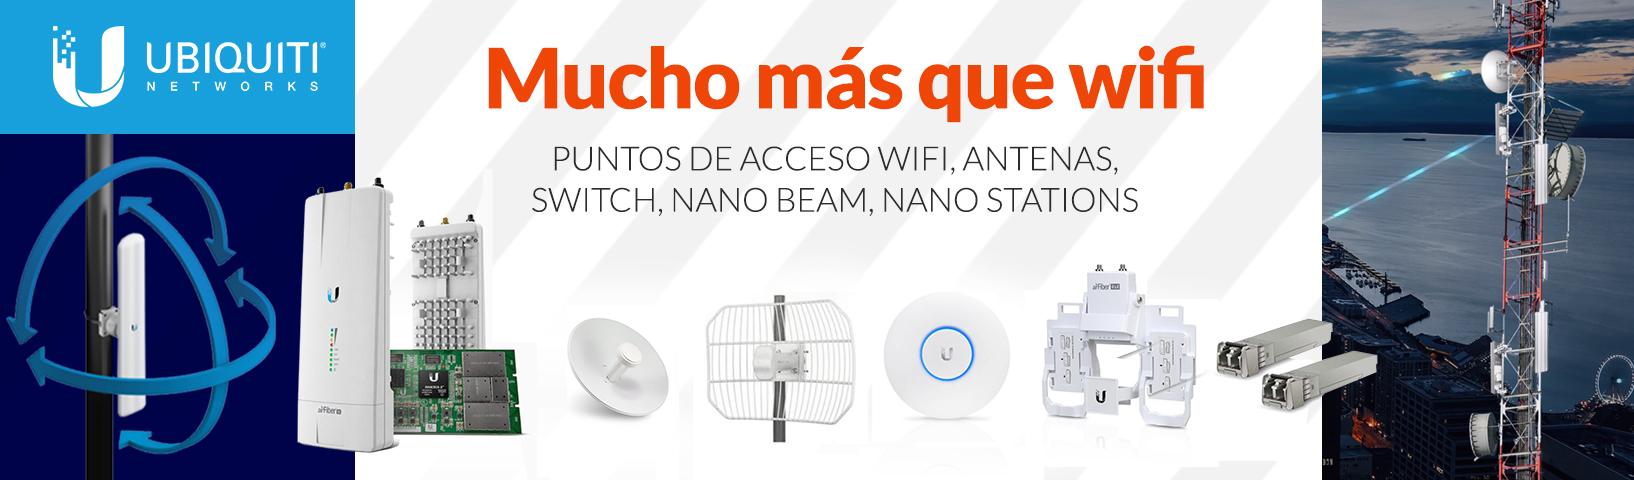 ubiquiti-networks.jpg